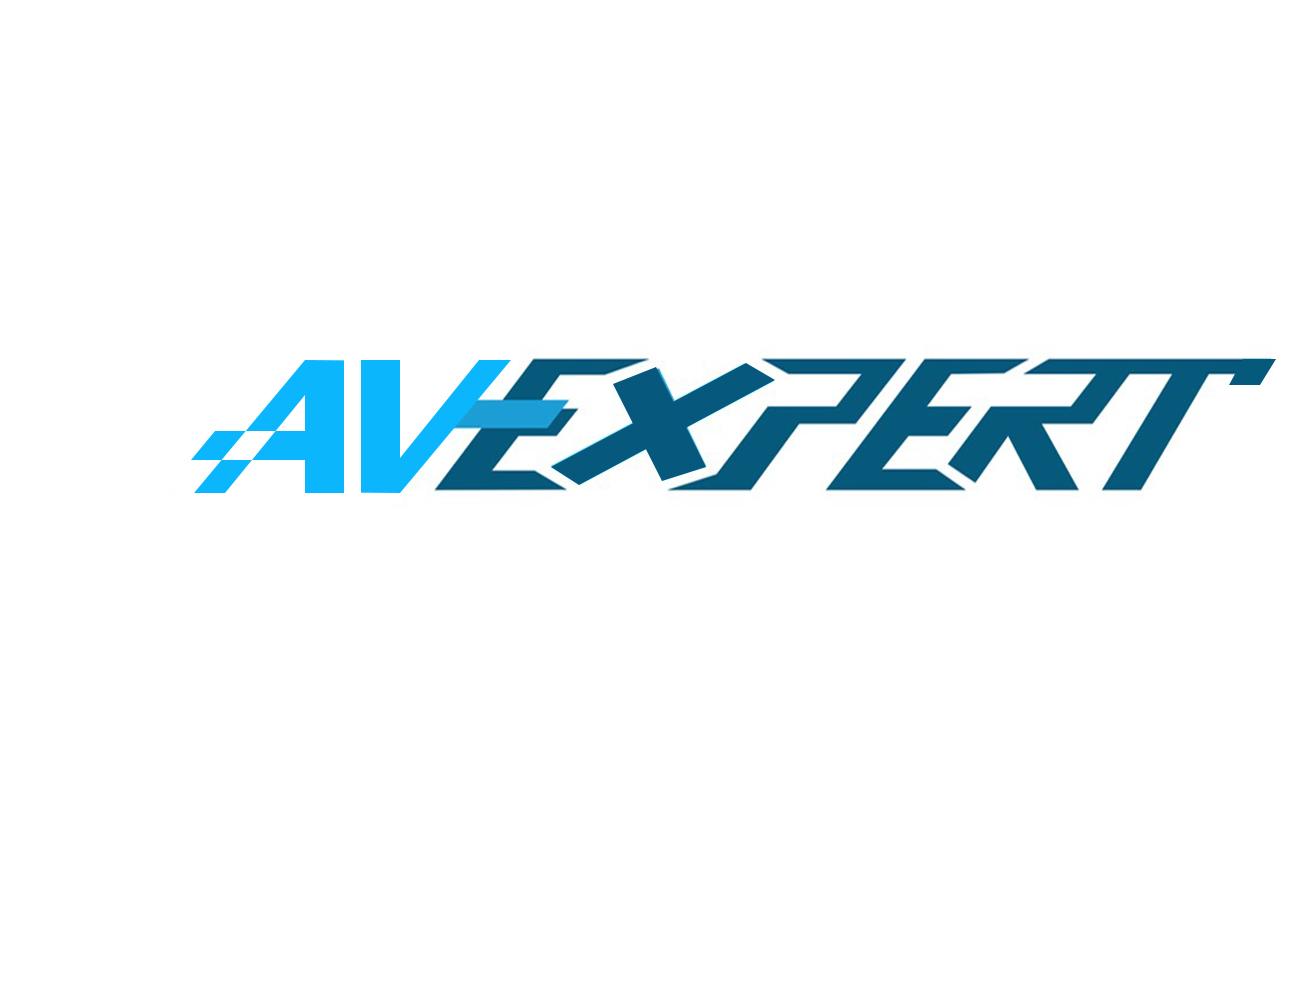 Создание логотипа, фирстиля фото f_3615c622b8527817.jpg